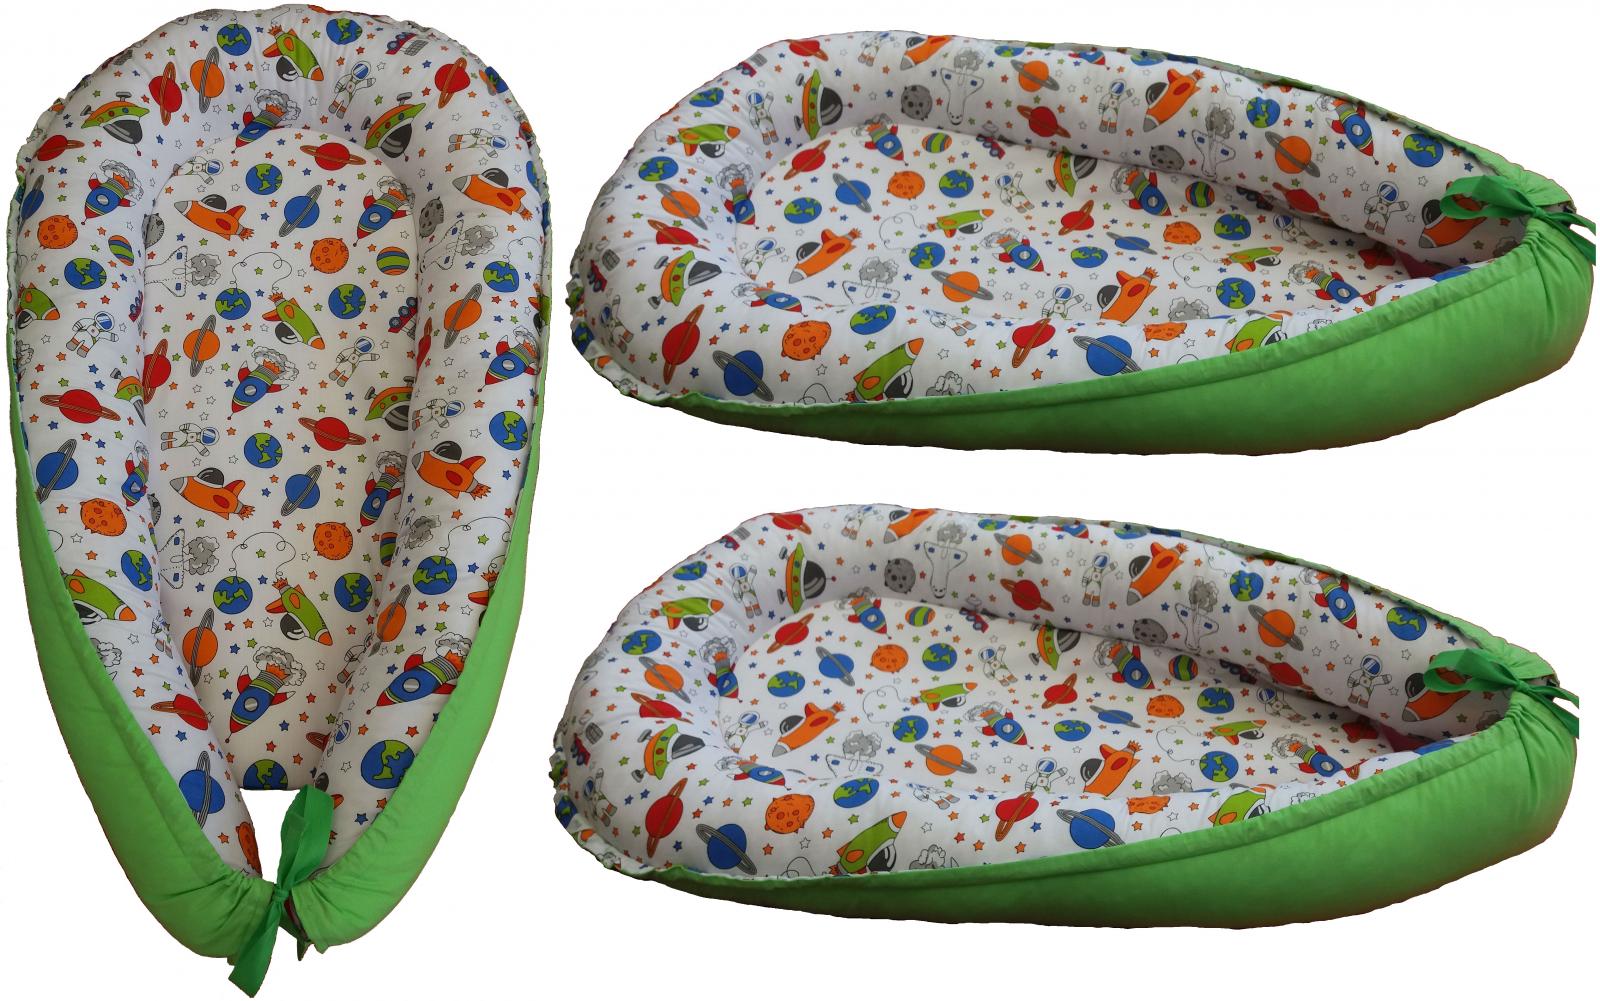 Hnízdečko pro miminko vesmír Miminkaabatolata